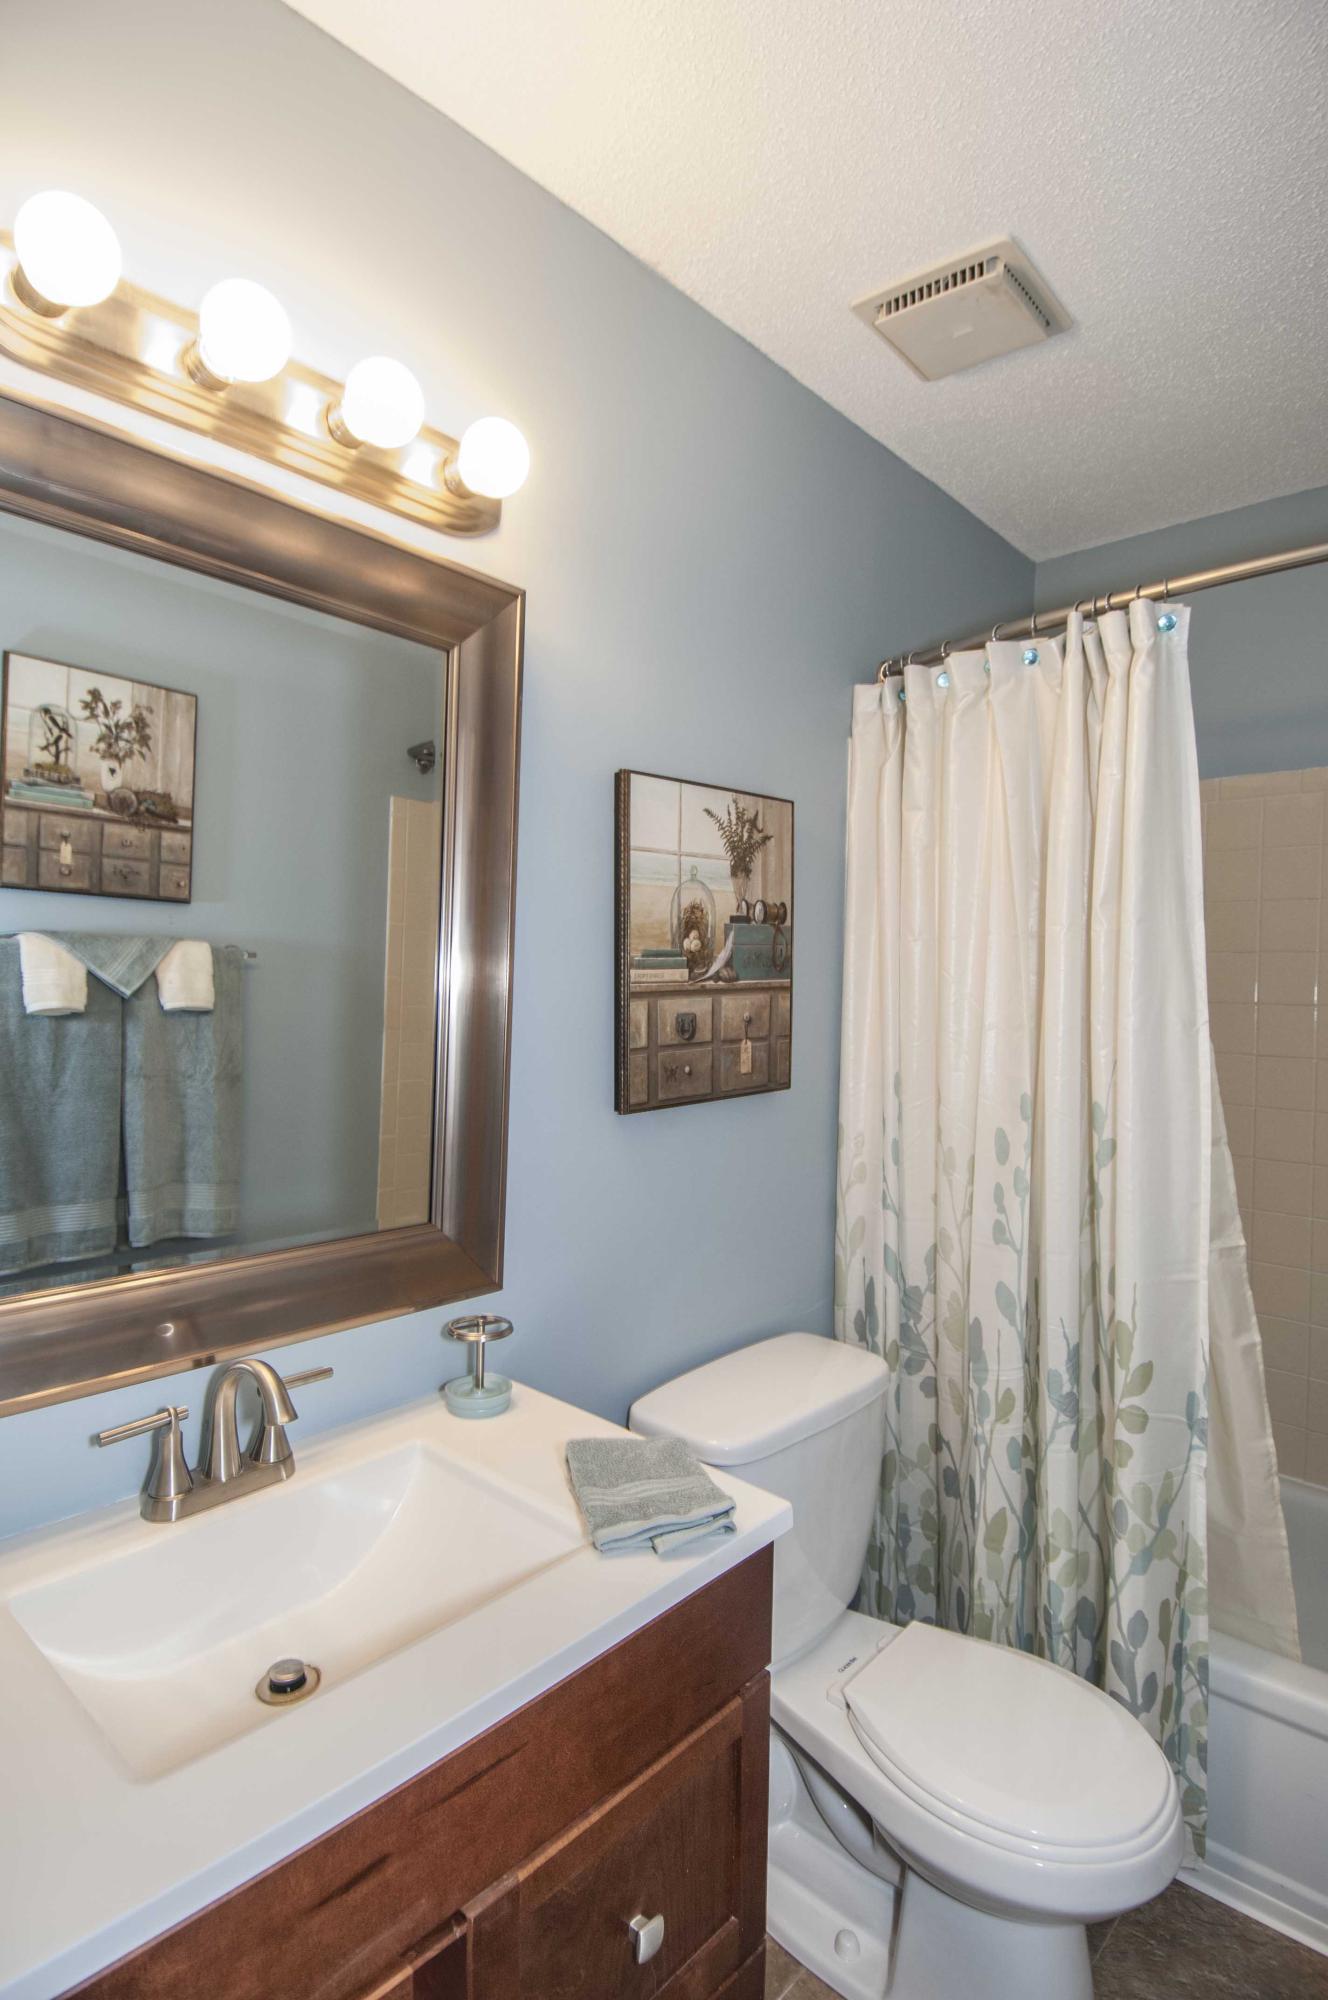 Parsonage Point Homes For Sale - 2362 Parsonage, Charleston, SC - 5